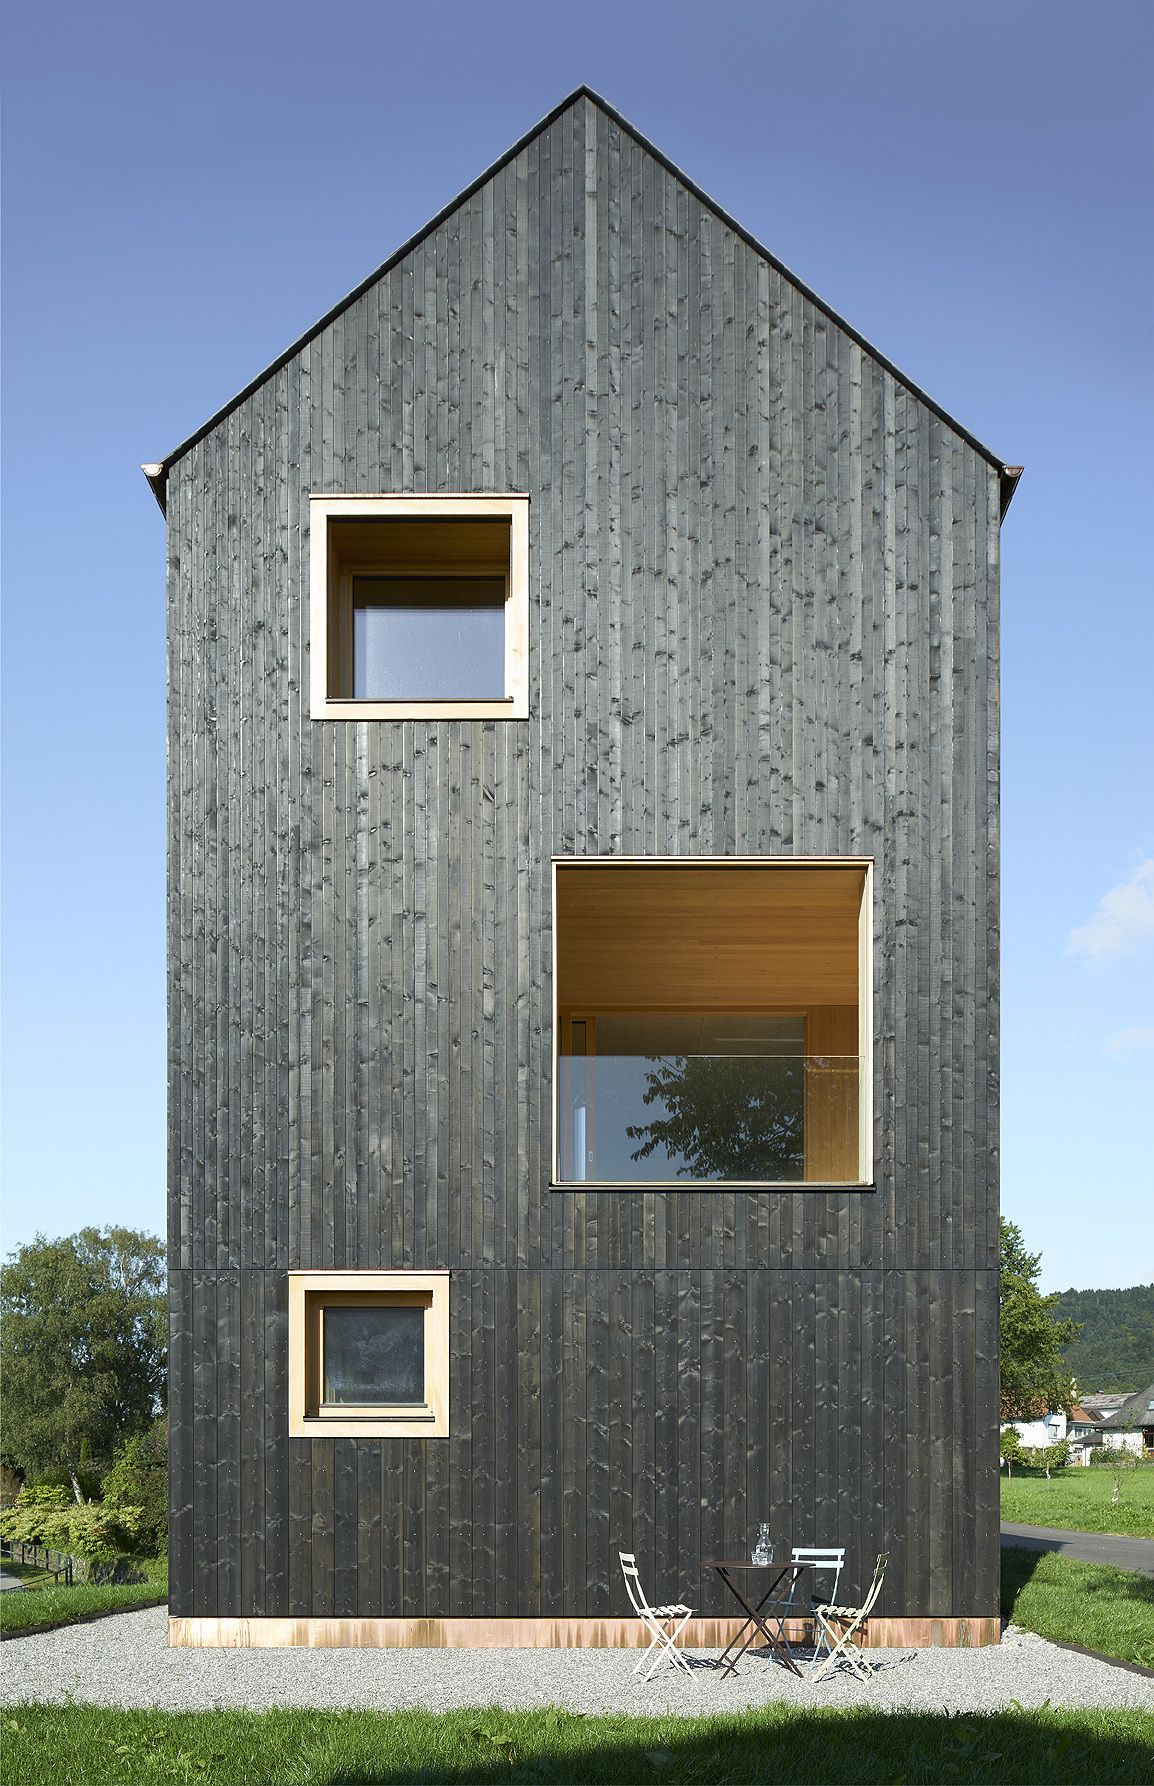 house b umle 2 bernardo bader fragments of architecture architecture pinterest haus. Black Bedroom Furniture Sets. Home Design Ideas